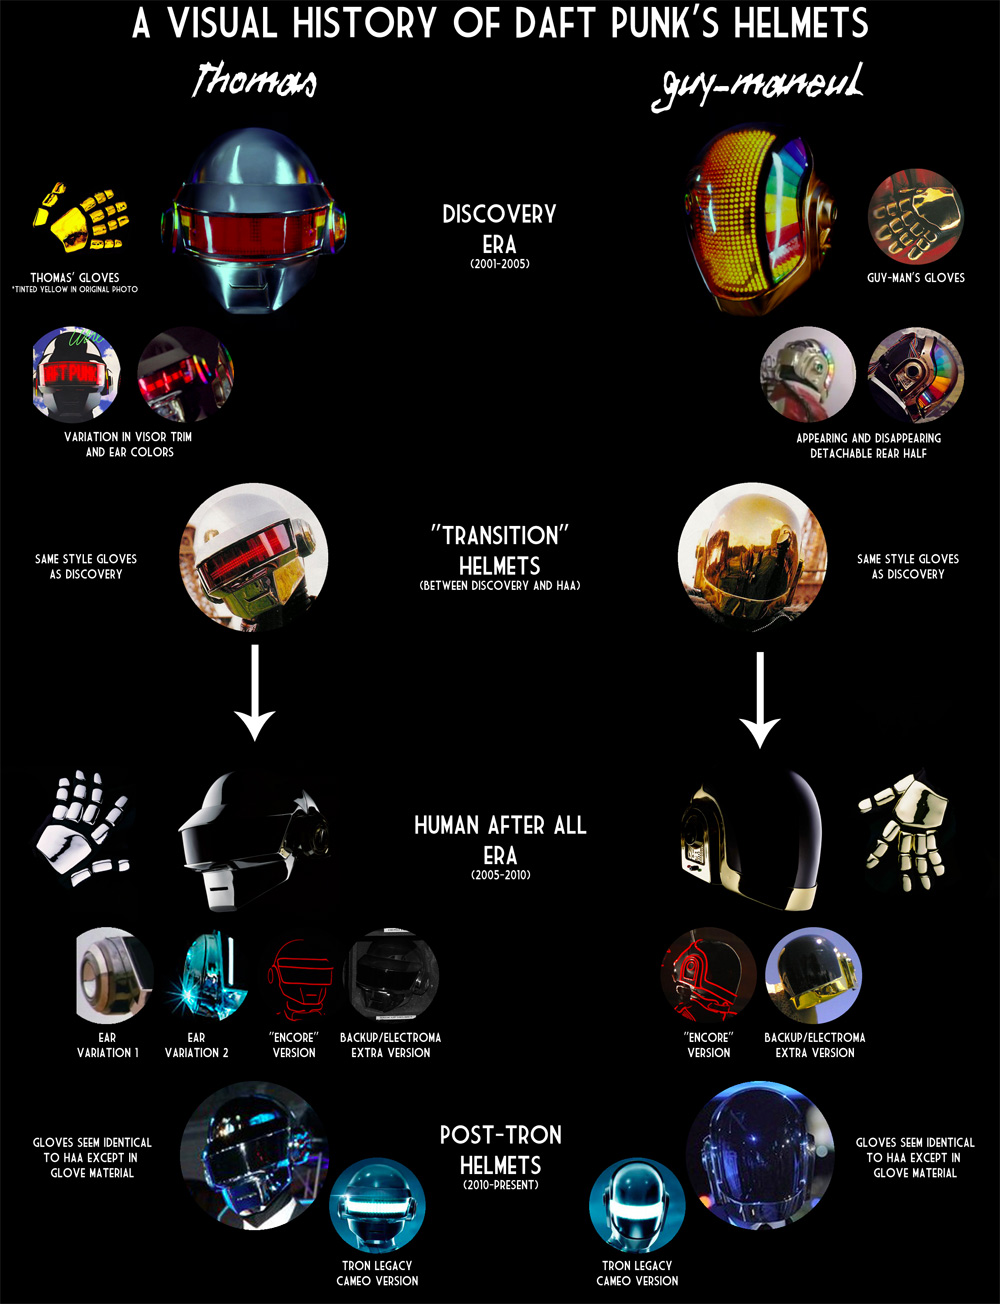 df8c730dbb9d5c776b9f41ce93960476 A Visual History of Daft Punks Helmets